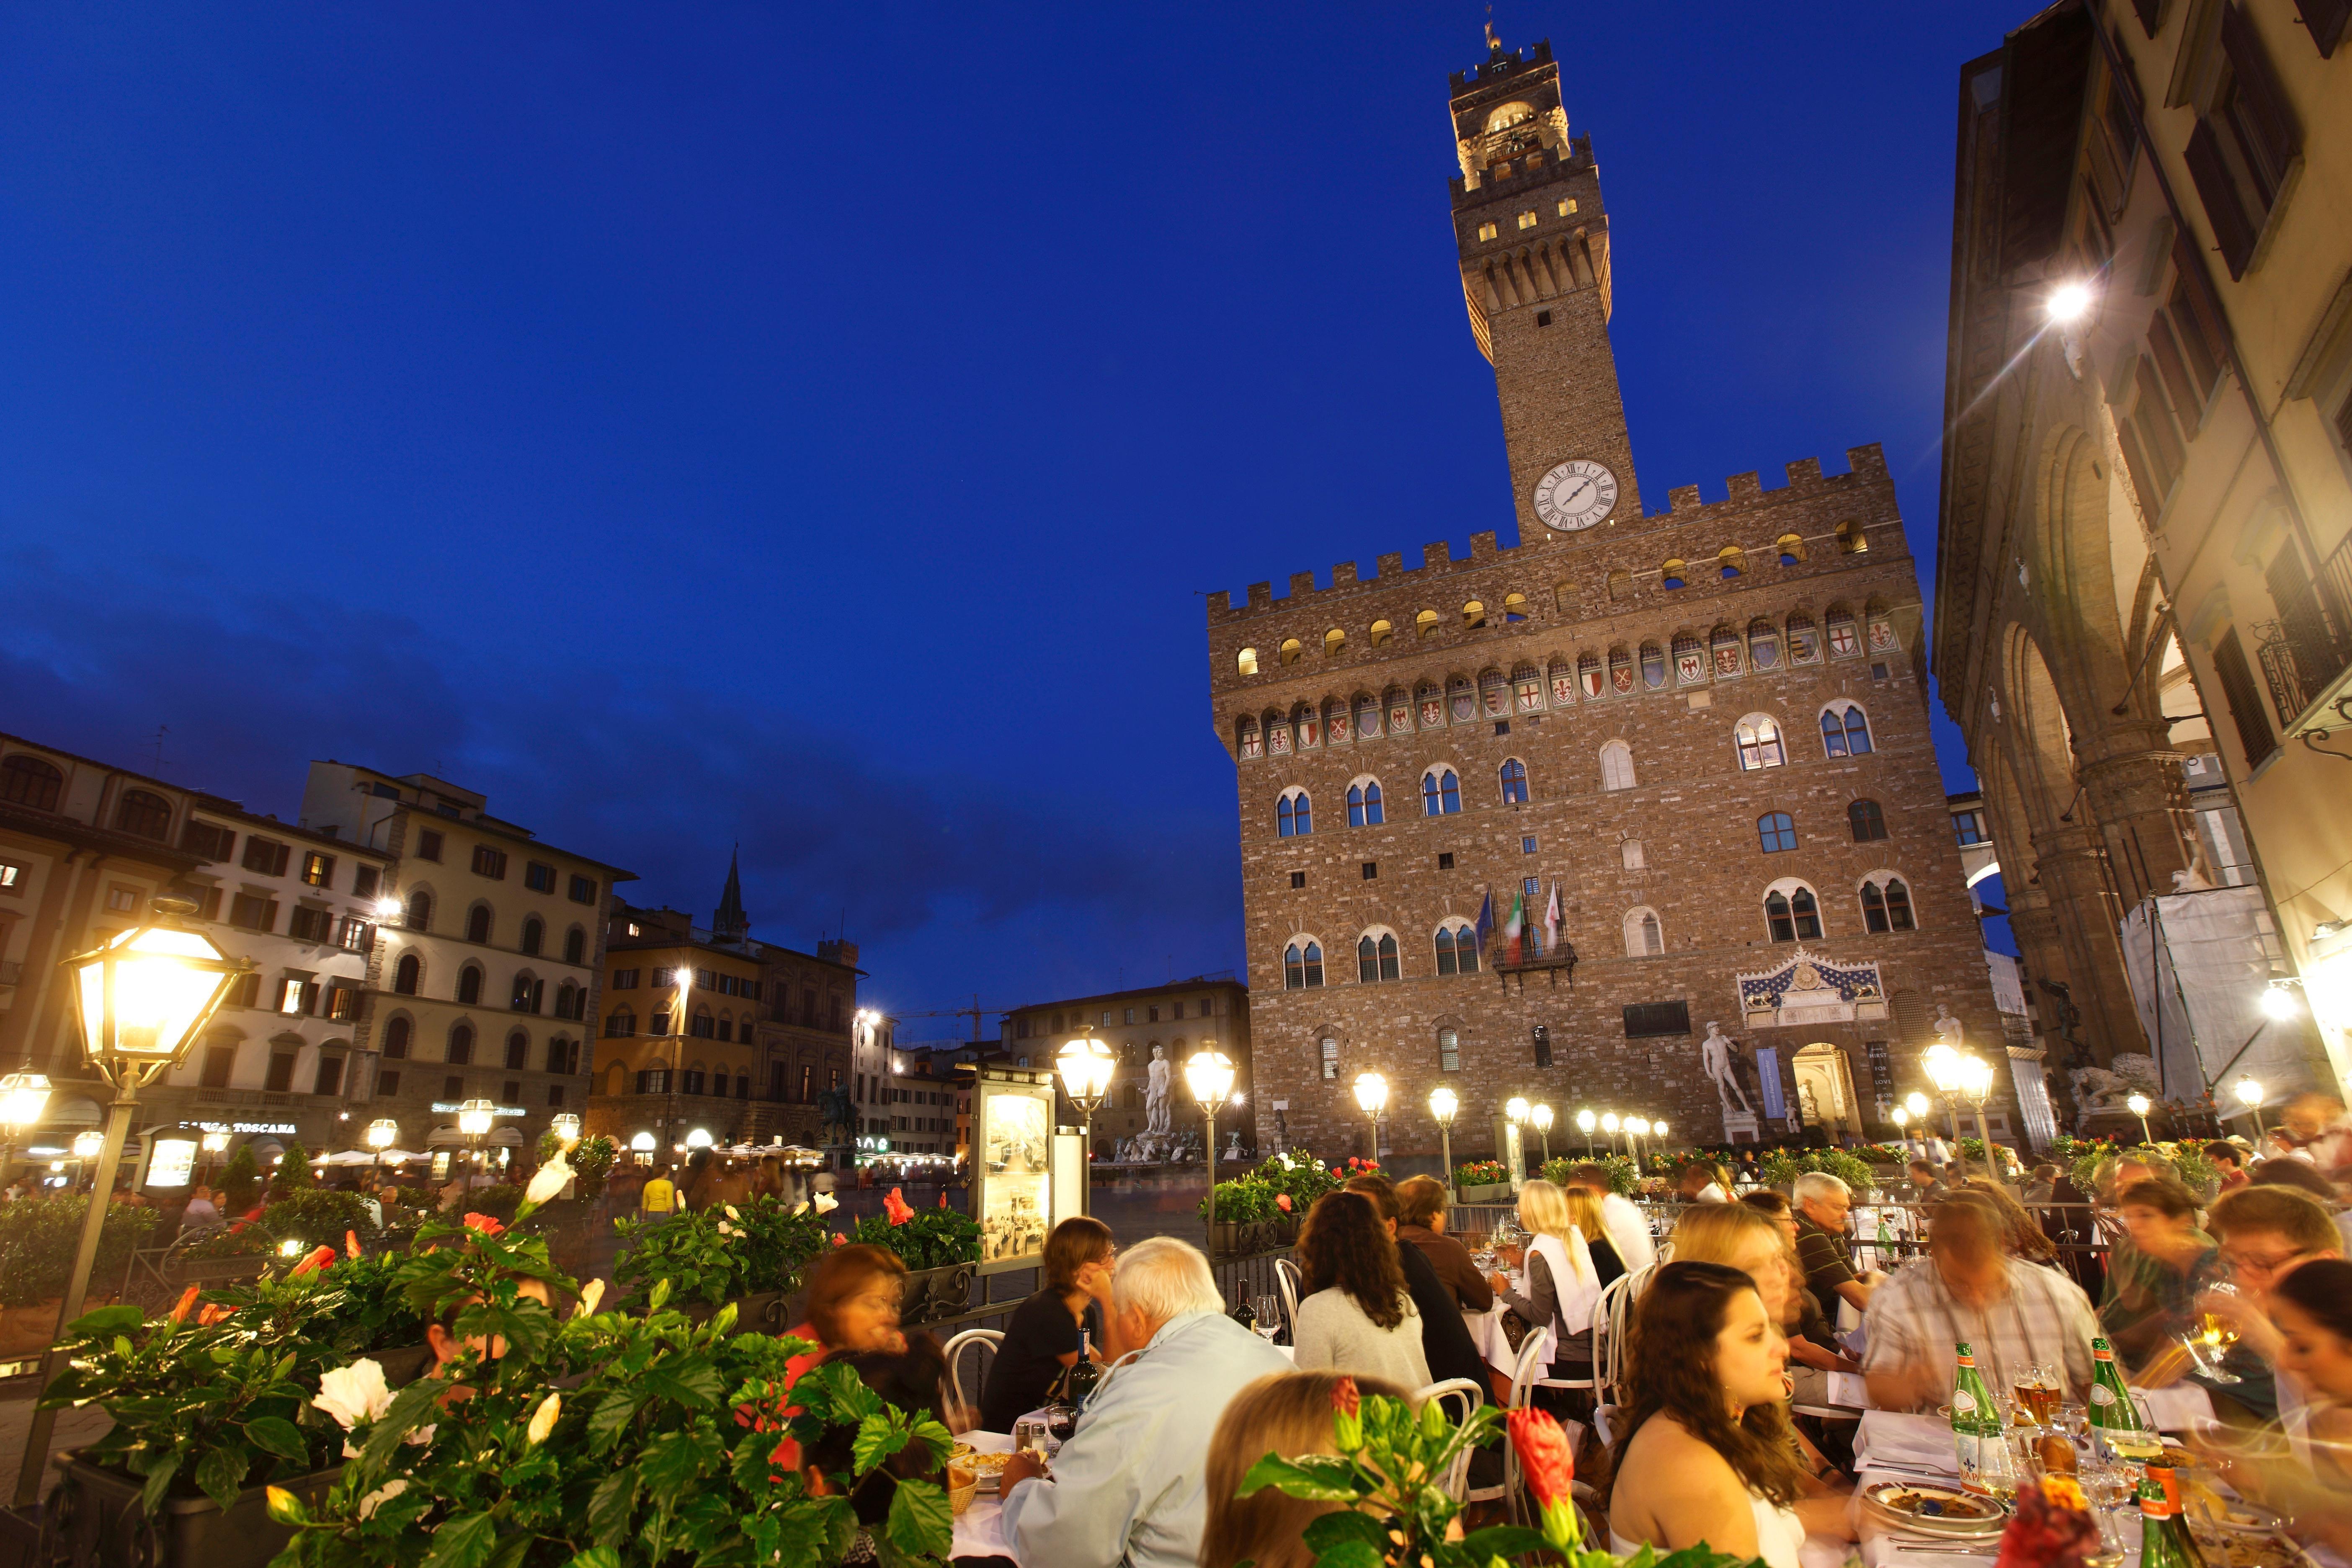 Top Nightlife Experiences in Florence